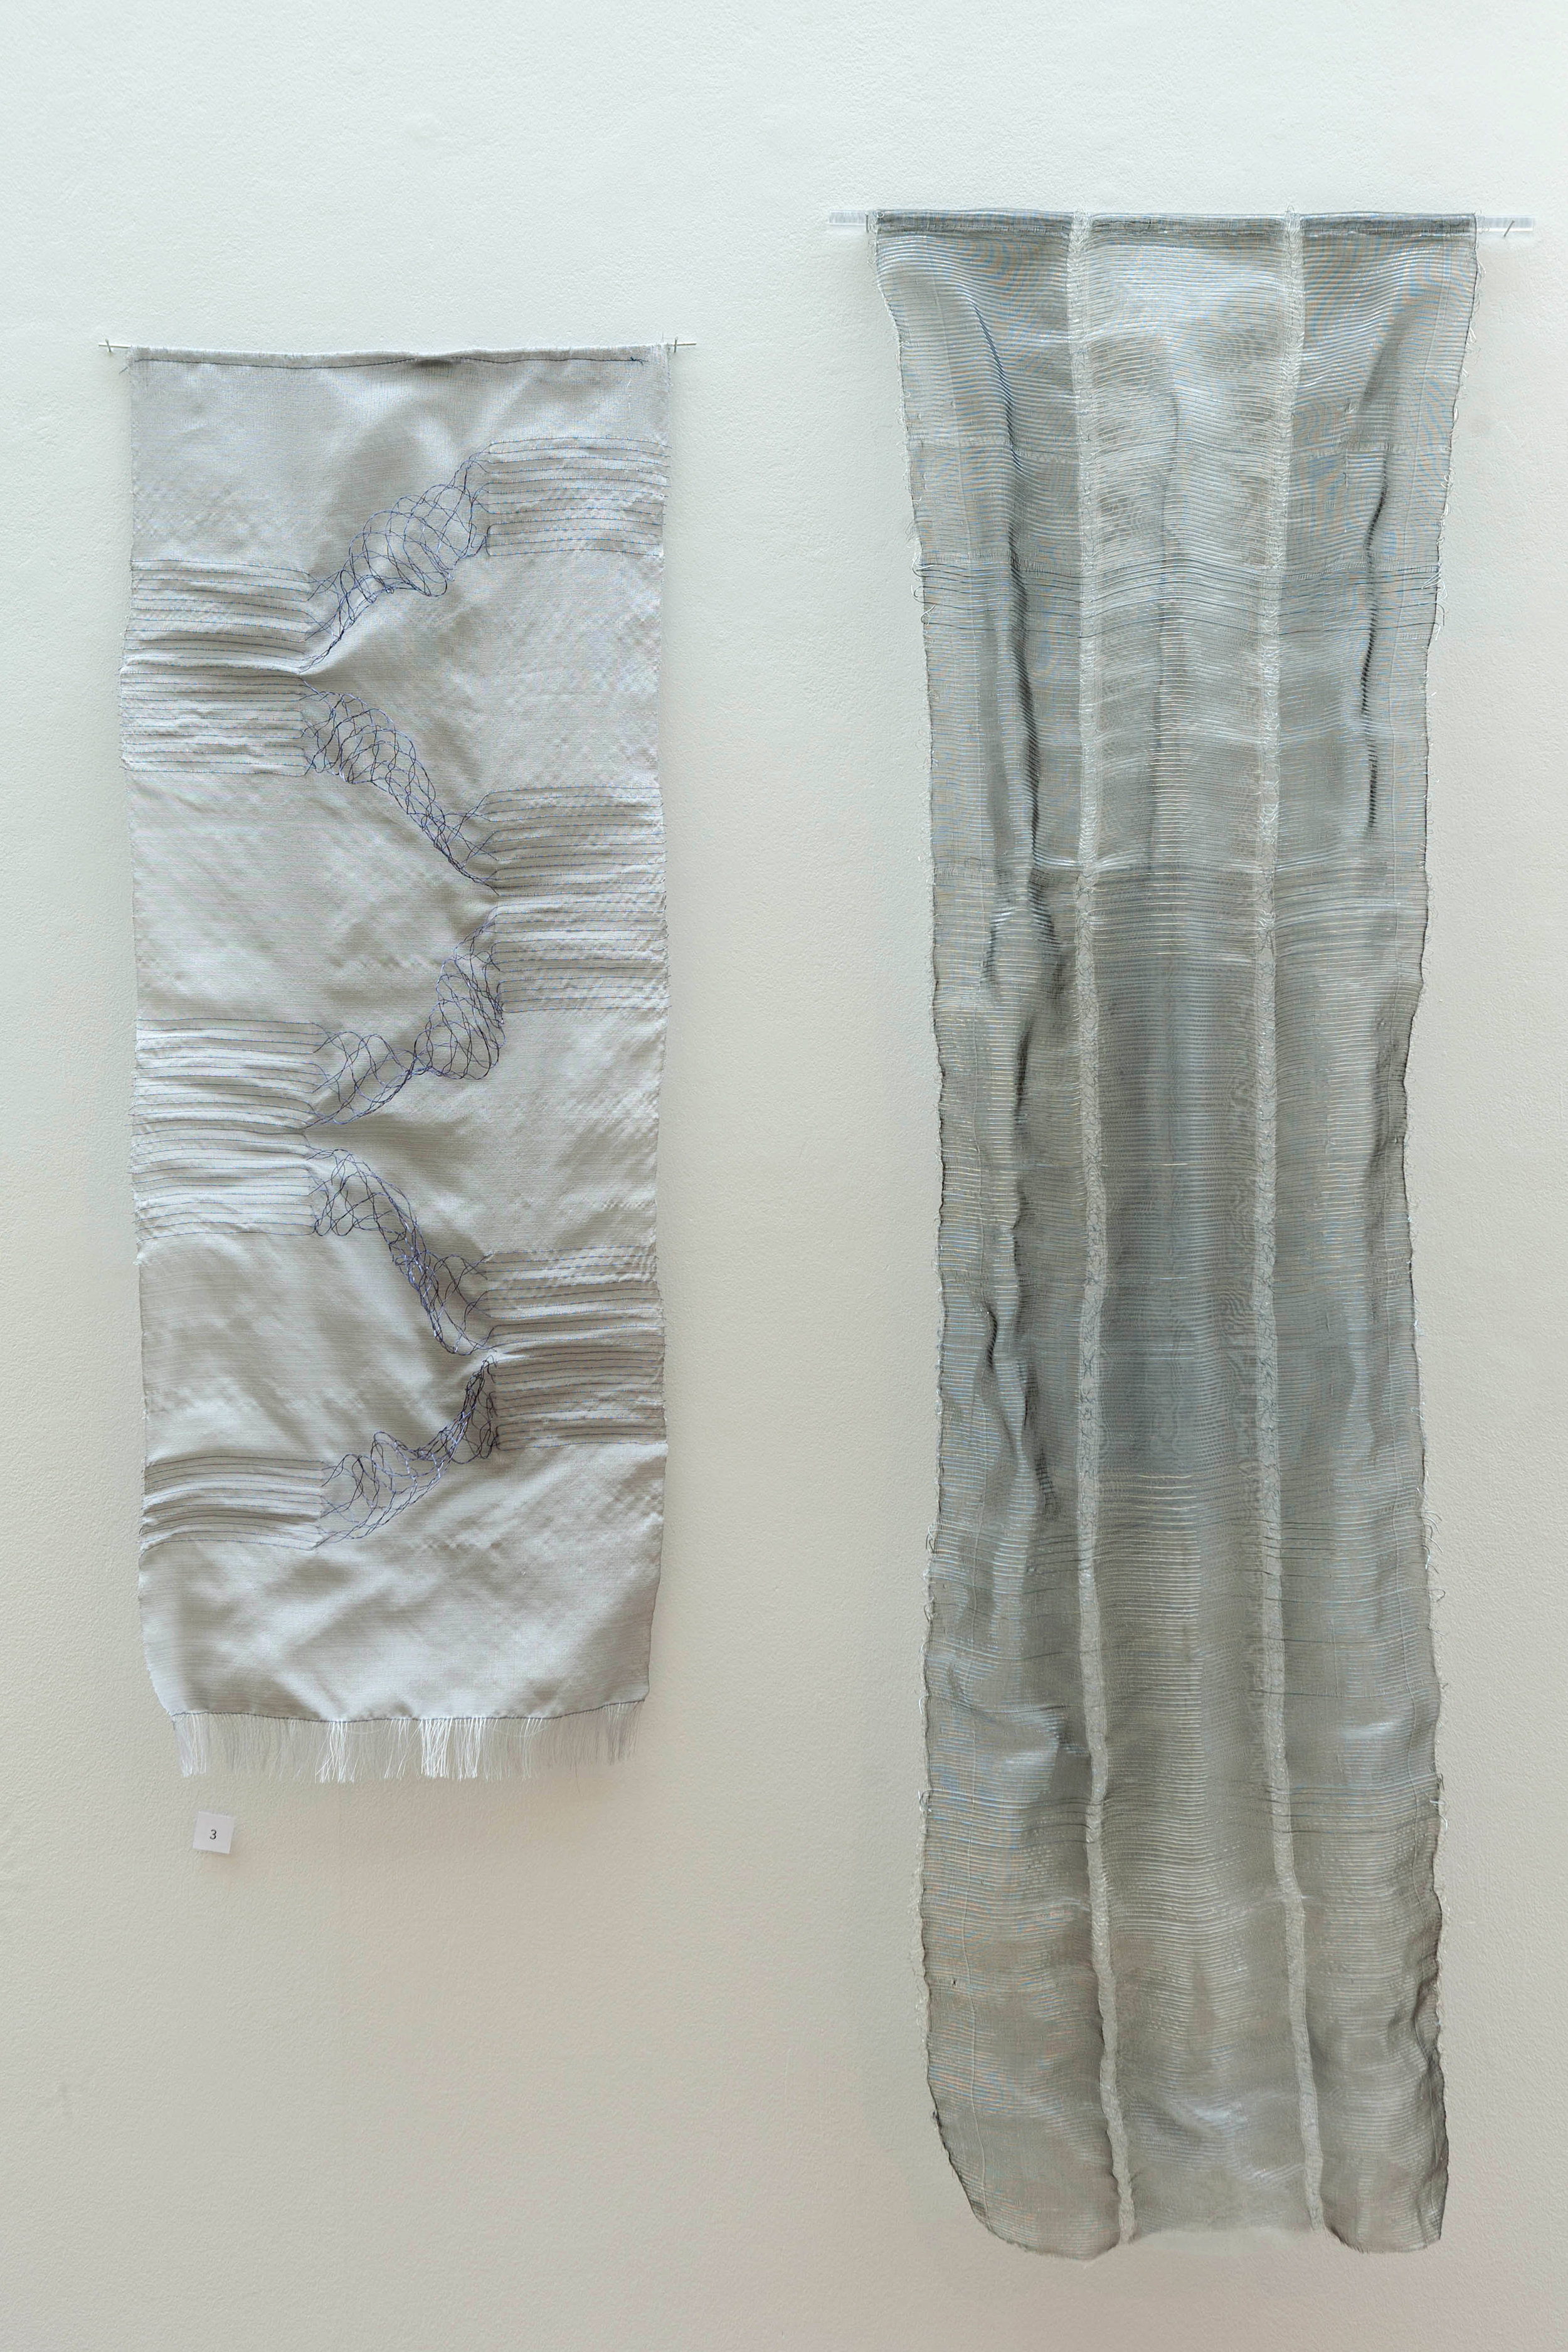 Twists I & Tubular Weave